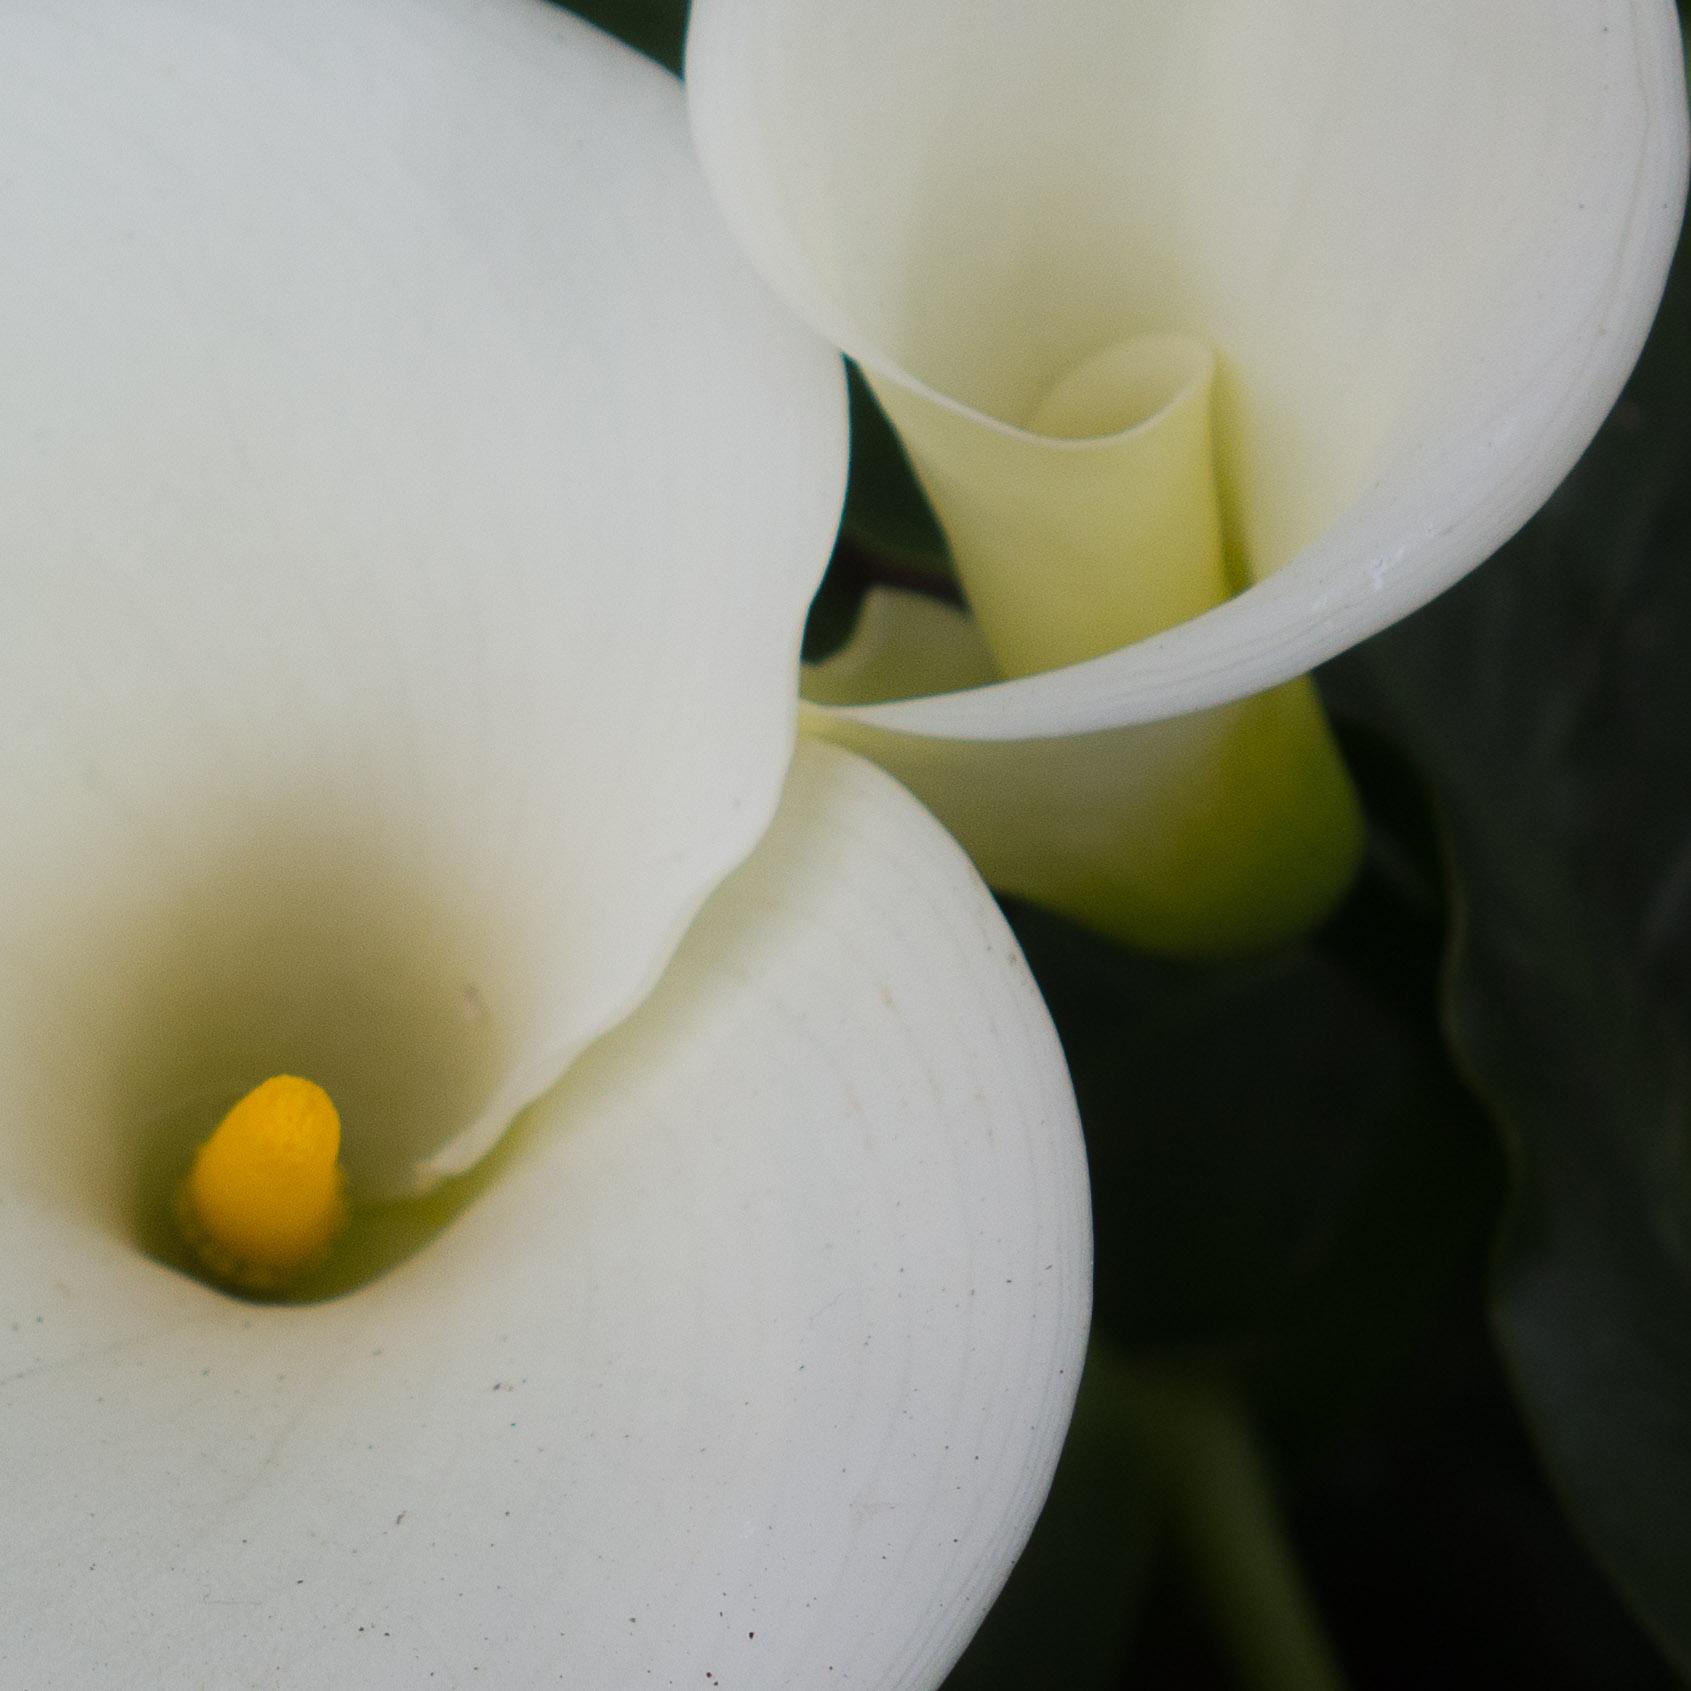 151207 Lily Embrace 1x1-02224.jpg